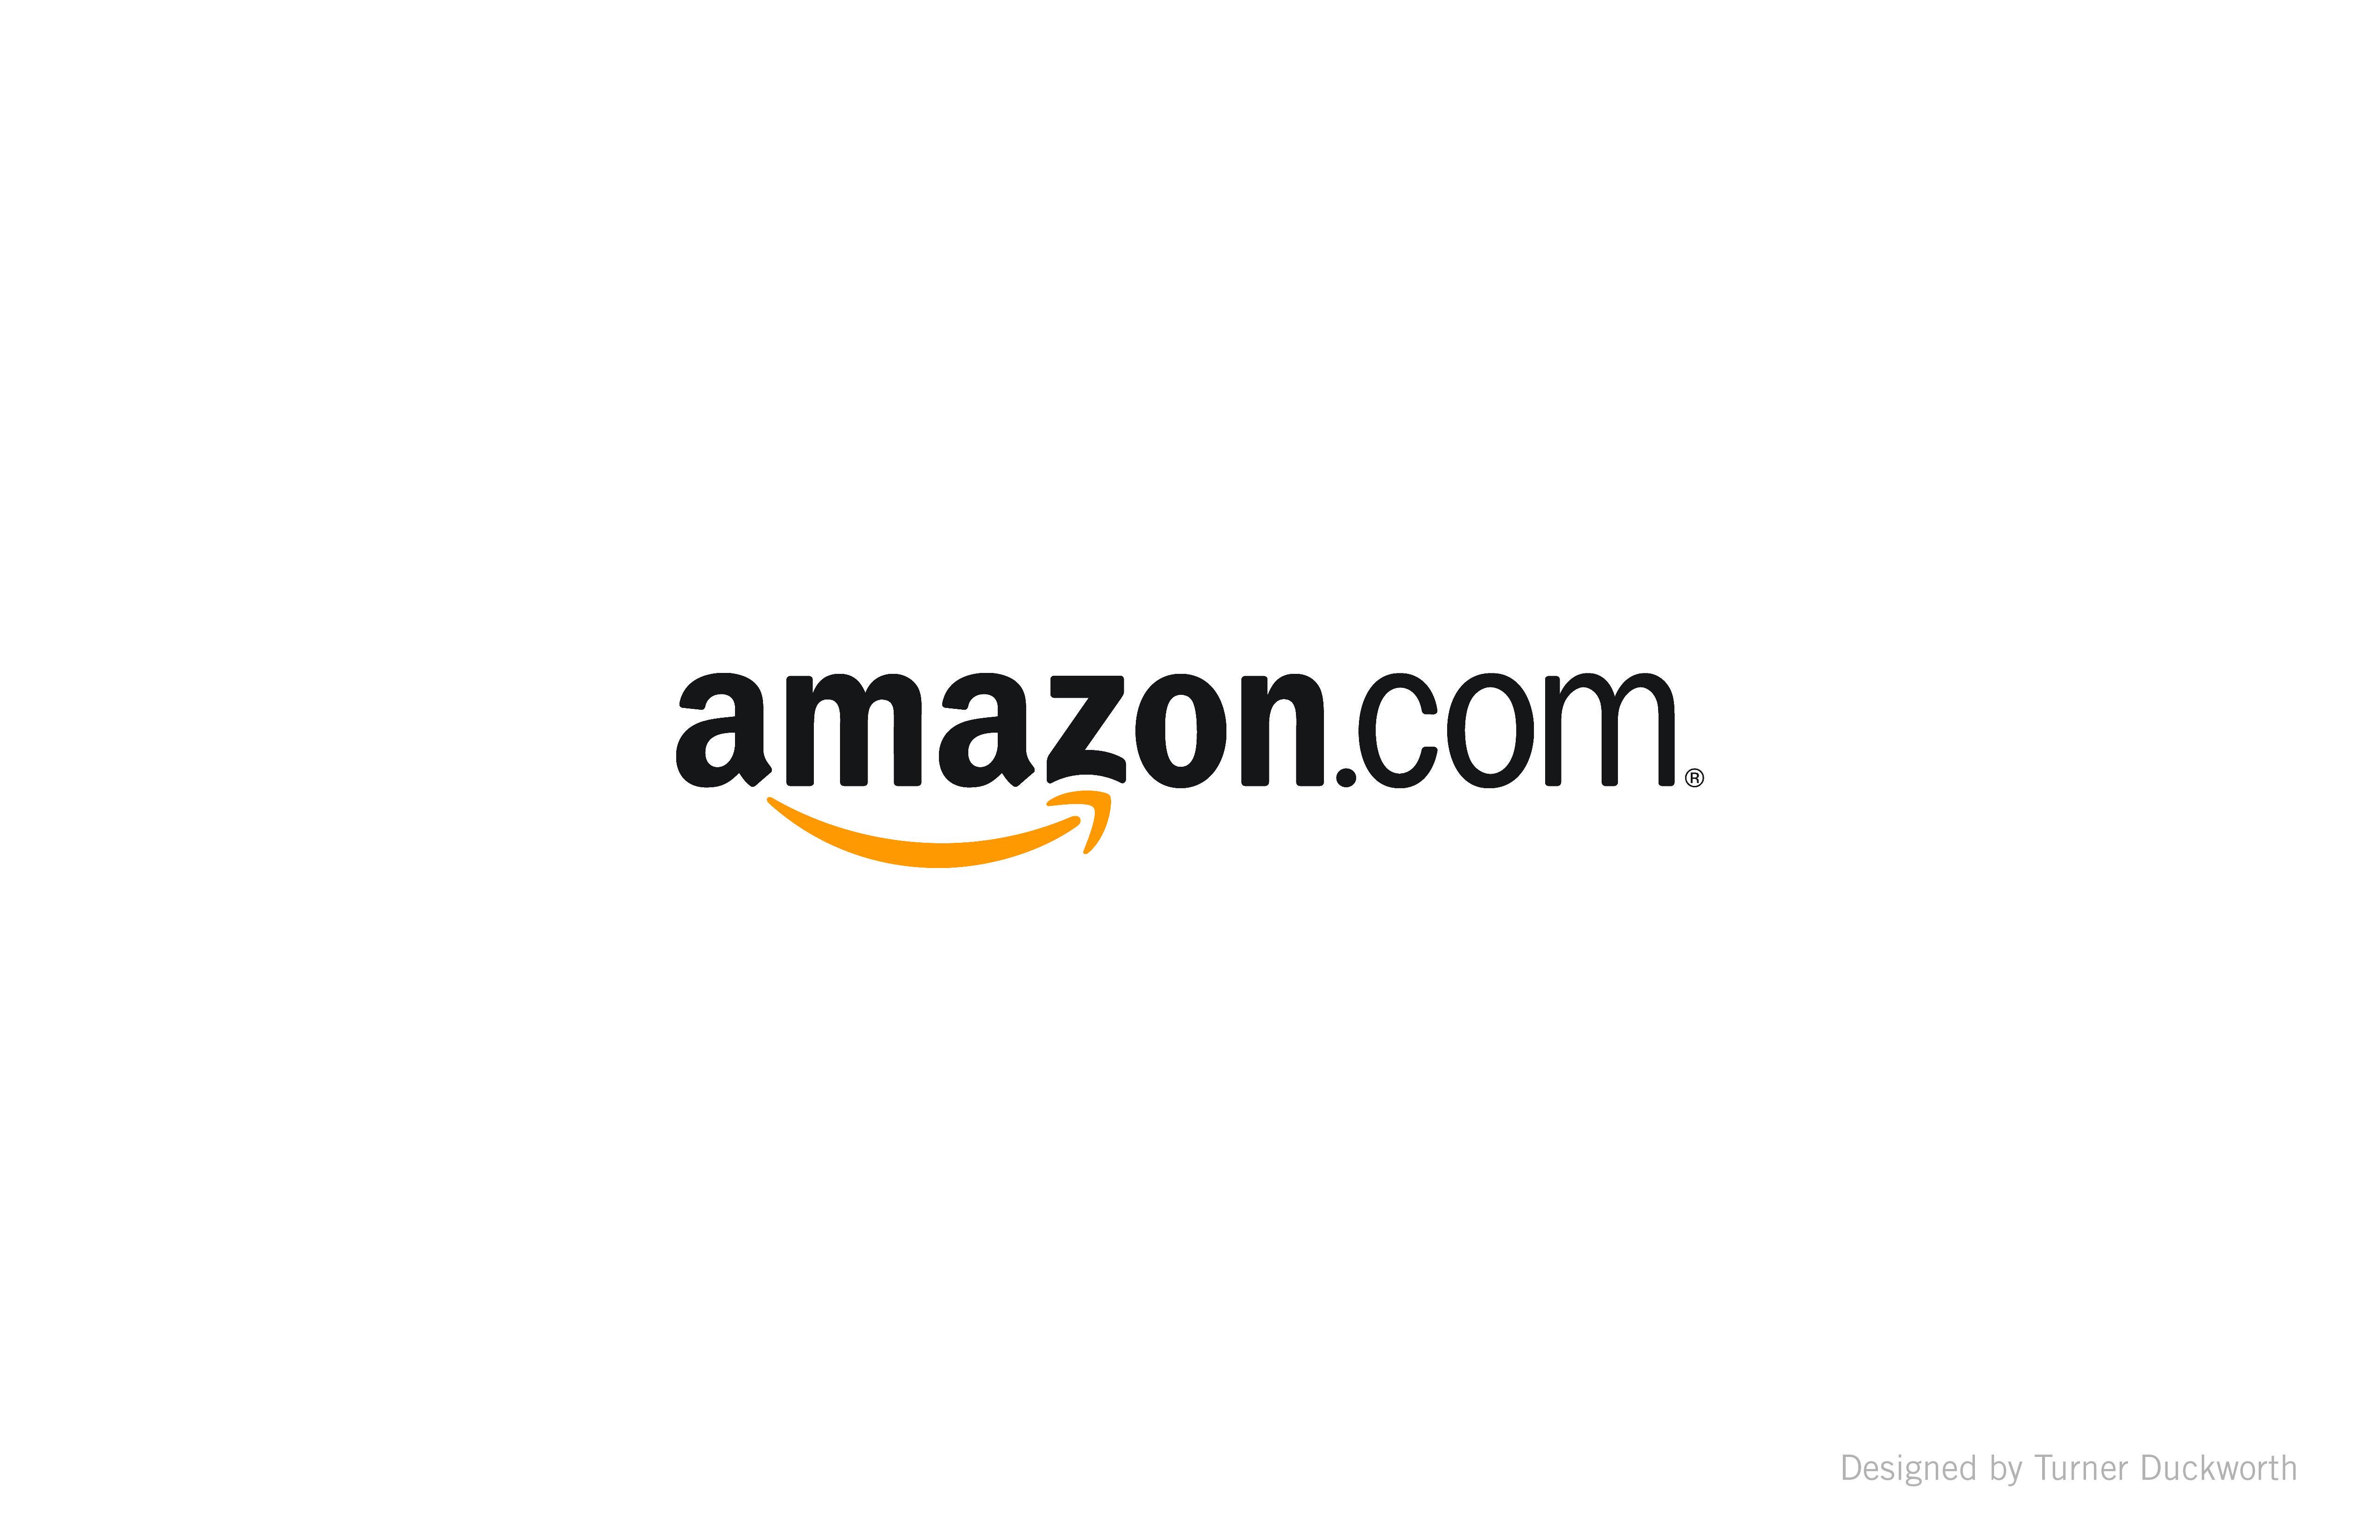 Amazon Com Logo Design By Turner Duckworth Branding Design Design